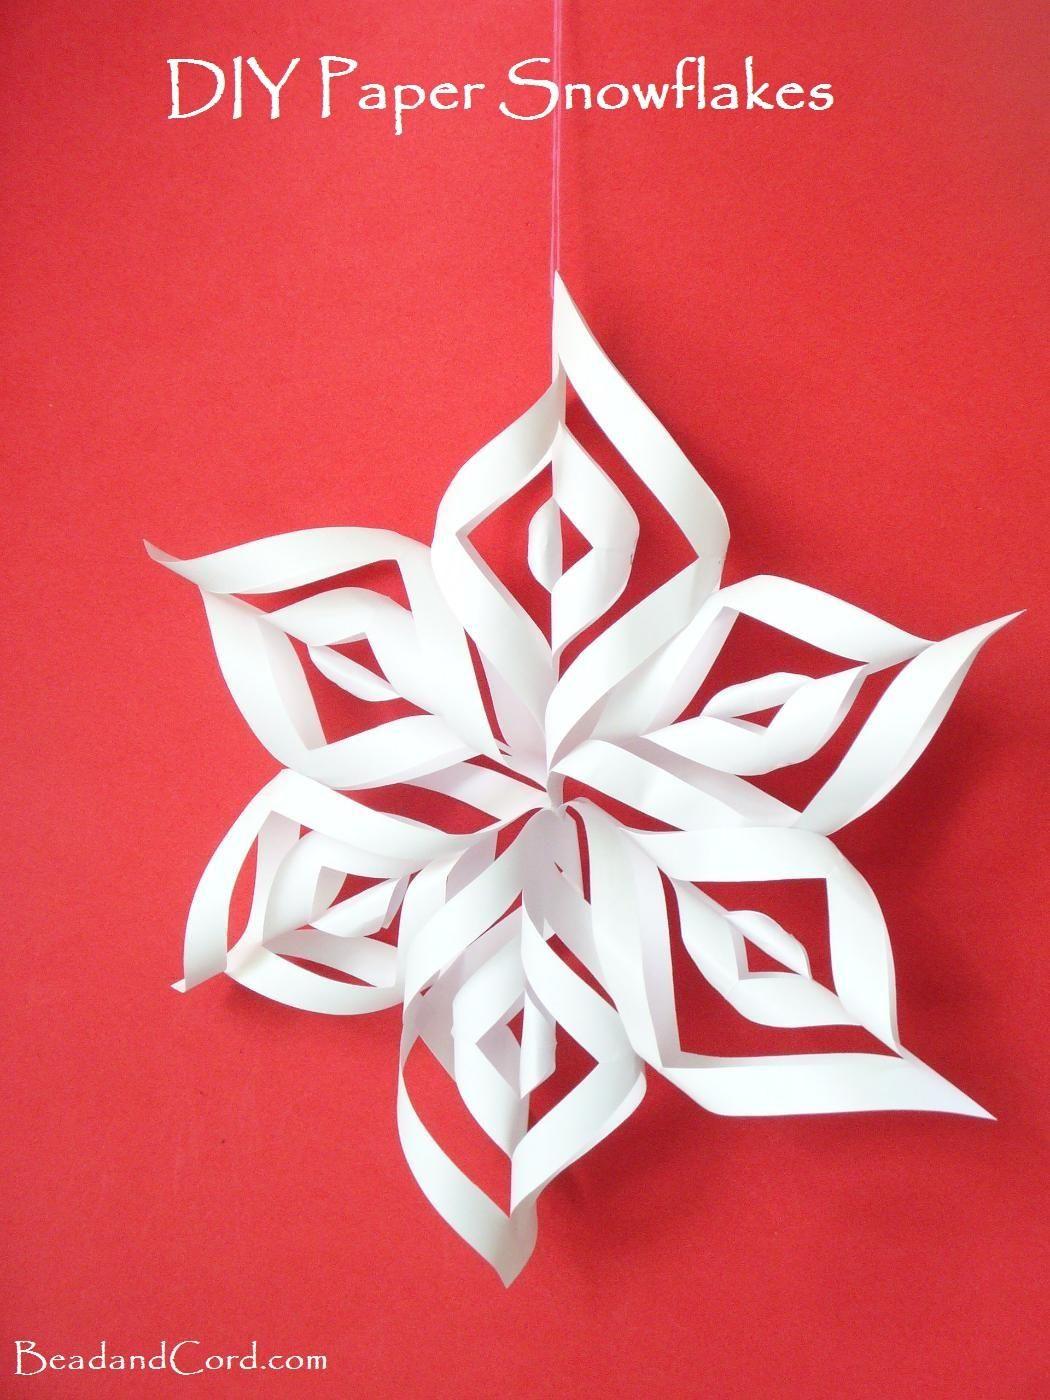 Make paper christmas decorations snowflakes - Diy 3d Paper Snowflakes